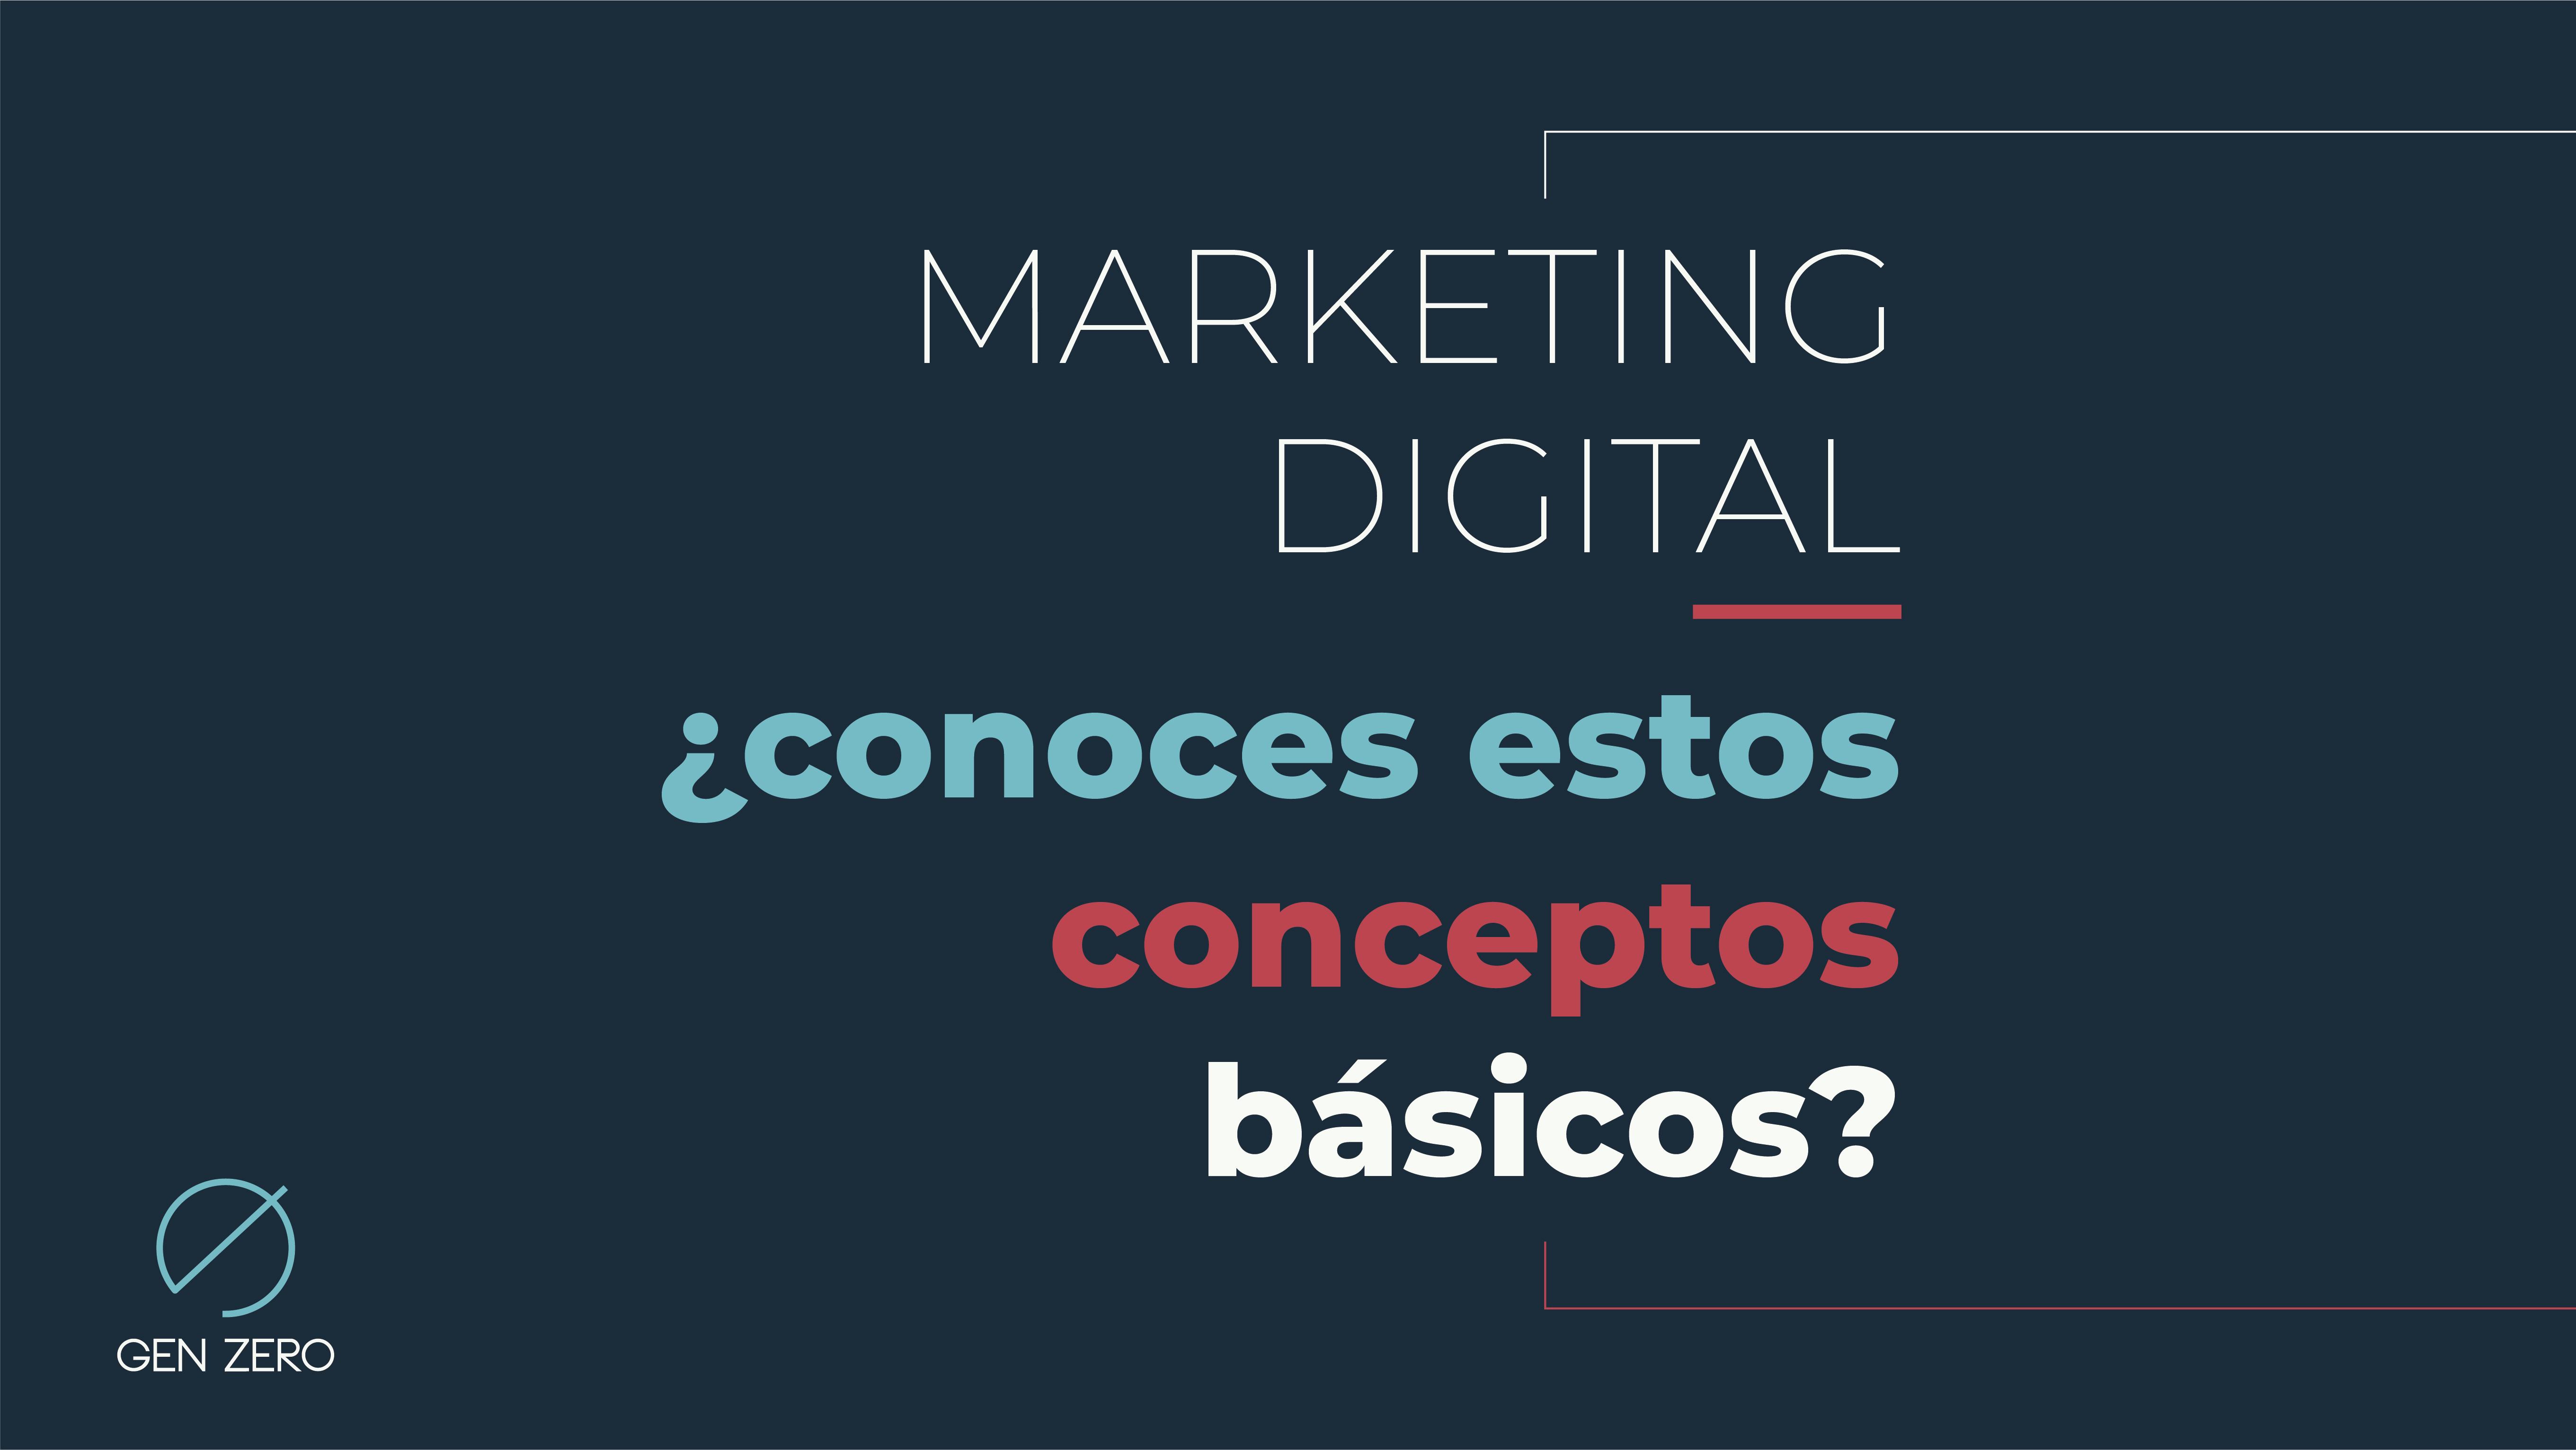 CONCEPTOS BÁSICOS DE MARKETING DIGITAL